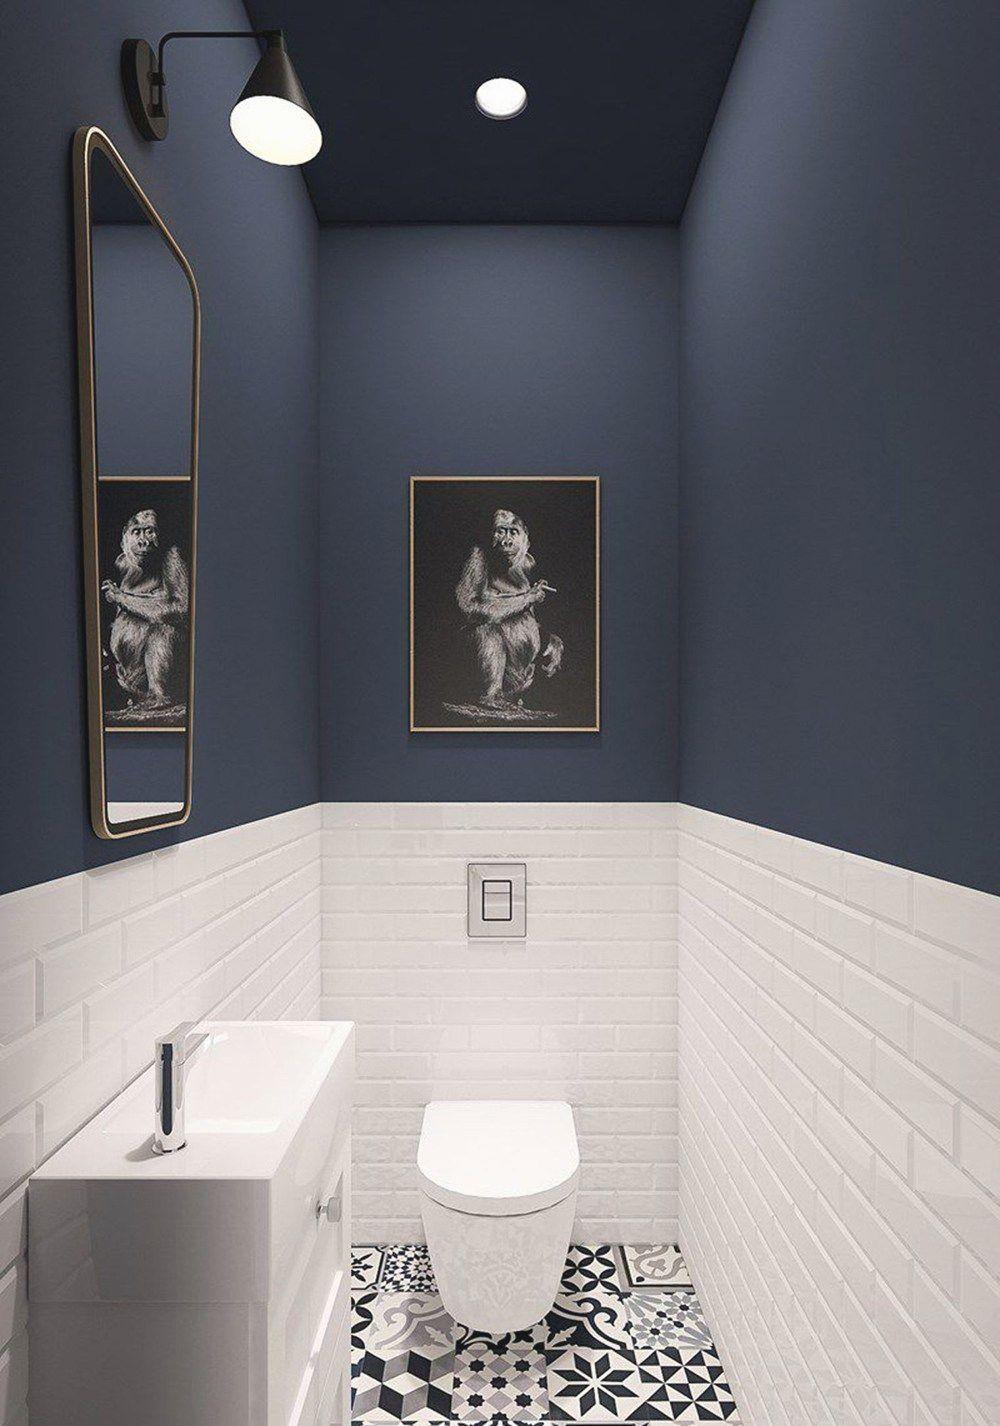 7 Home Decor Ideas Small Toilet Room Bathroom Design Trends Blue Wall Colors